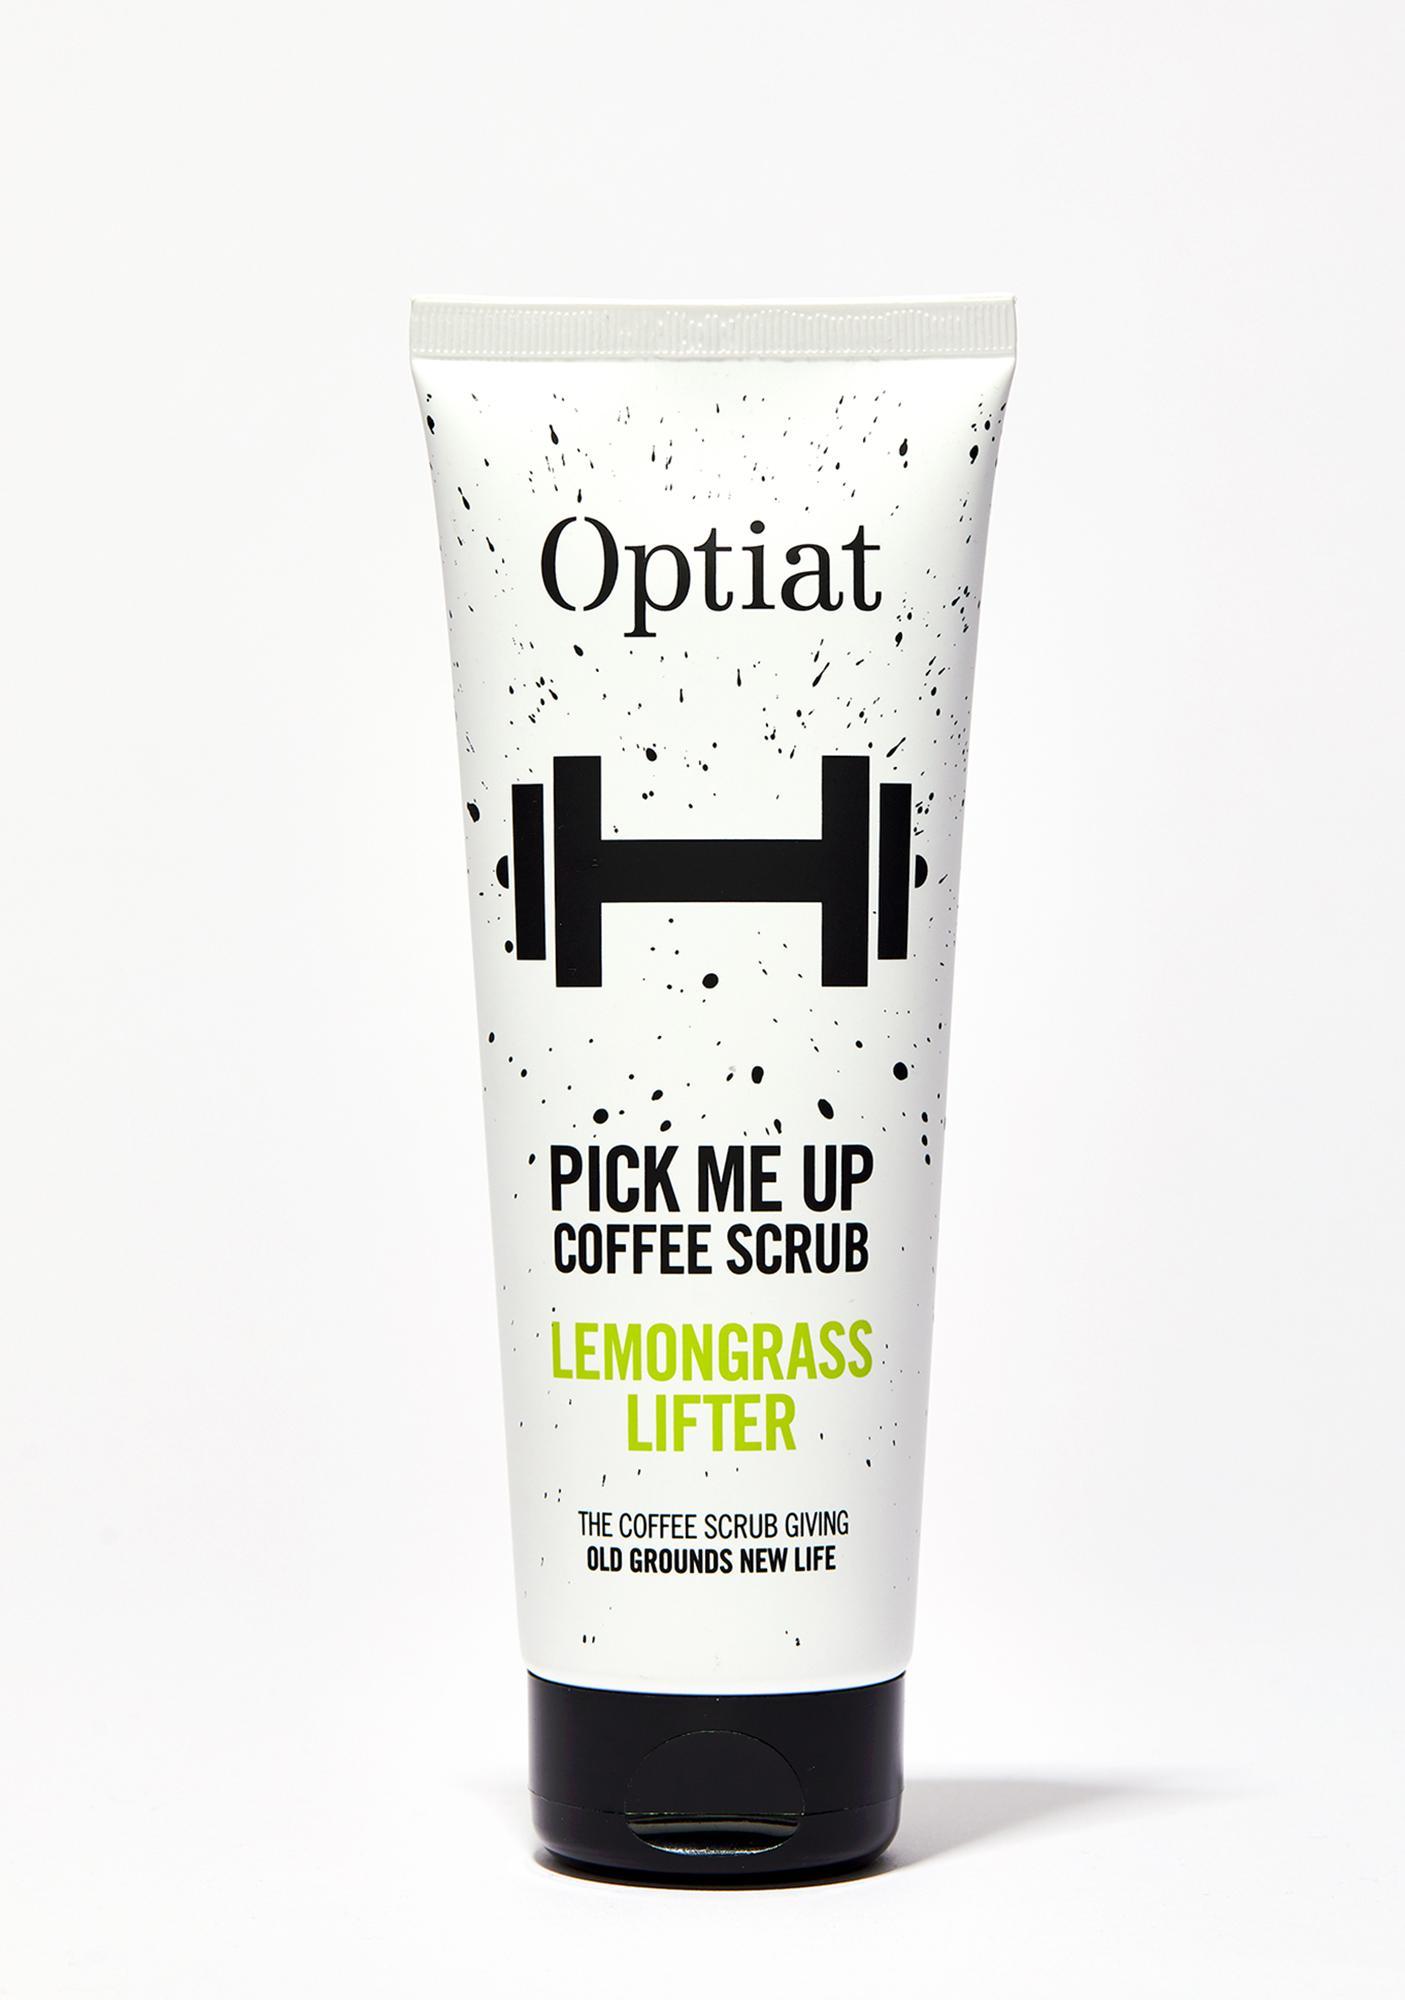 Optiat Pick Me Up Lemongrass Lifter Coffee Scrub